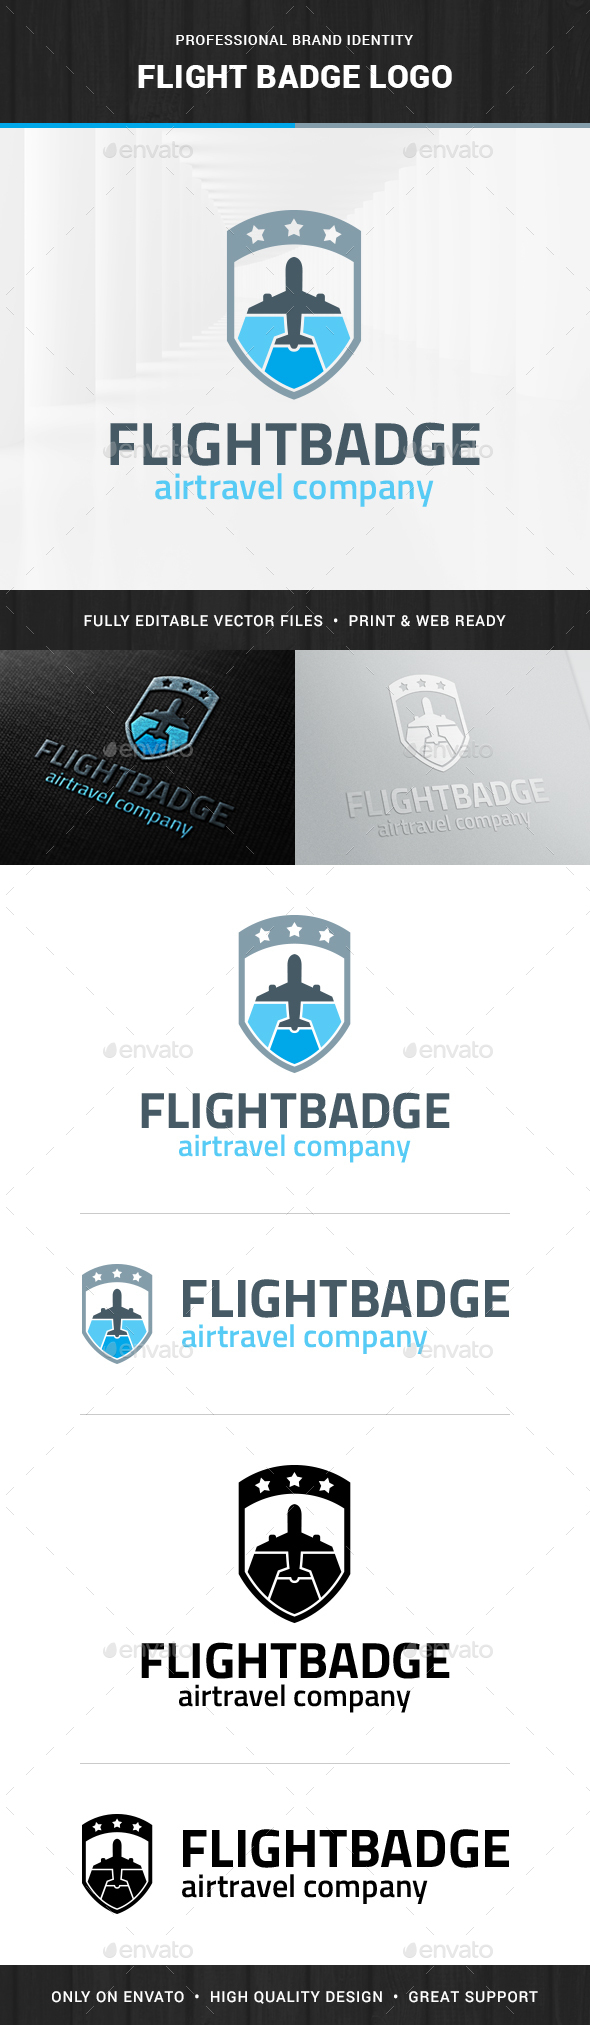 Flight Badge Logo Template - Objects Logo Templates